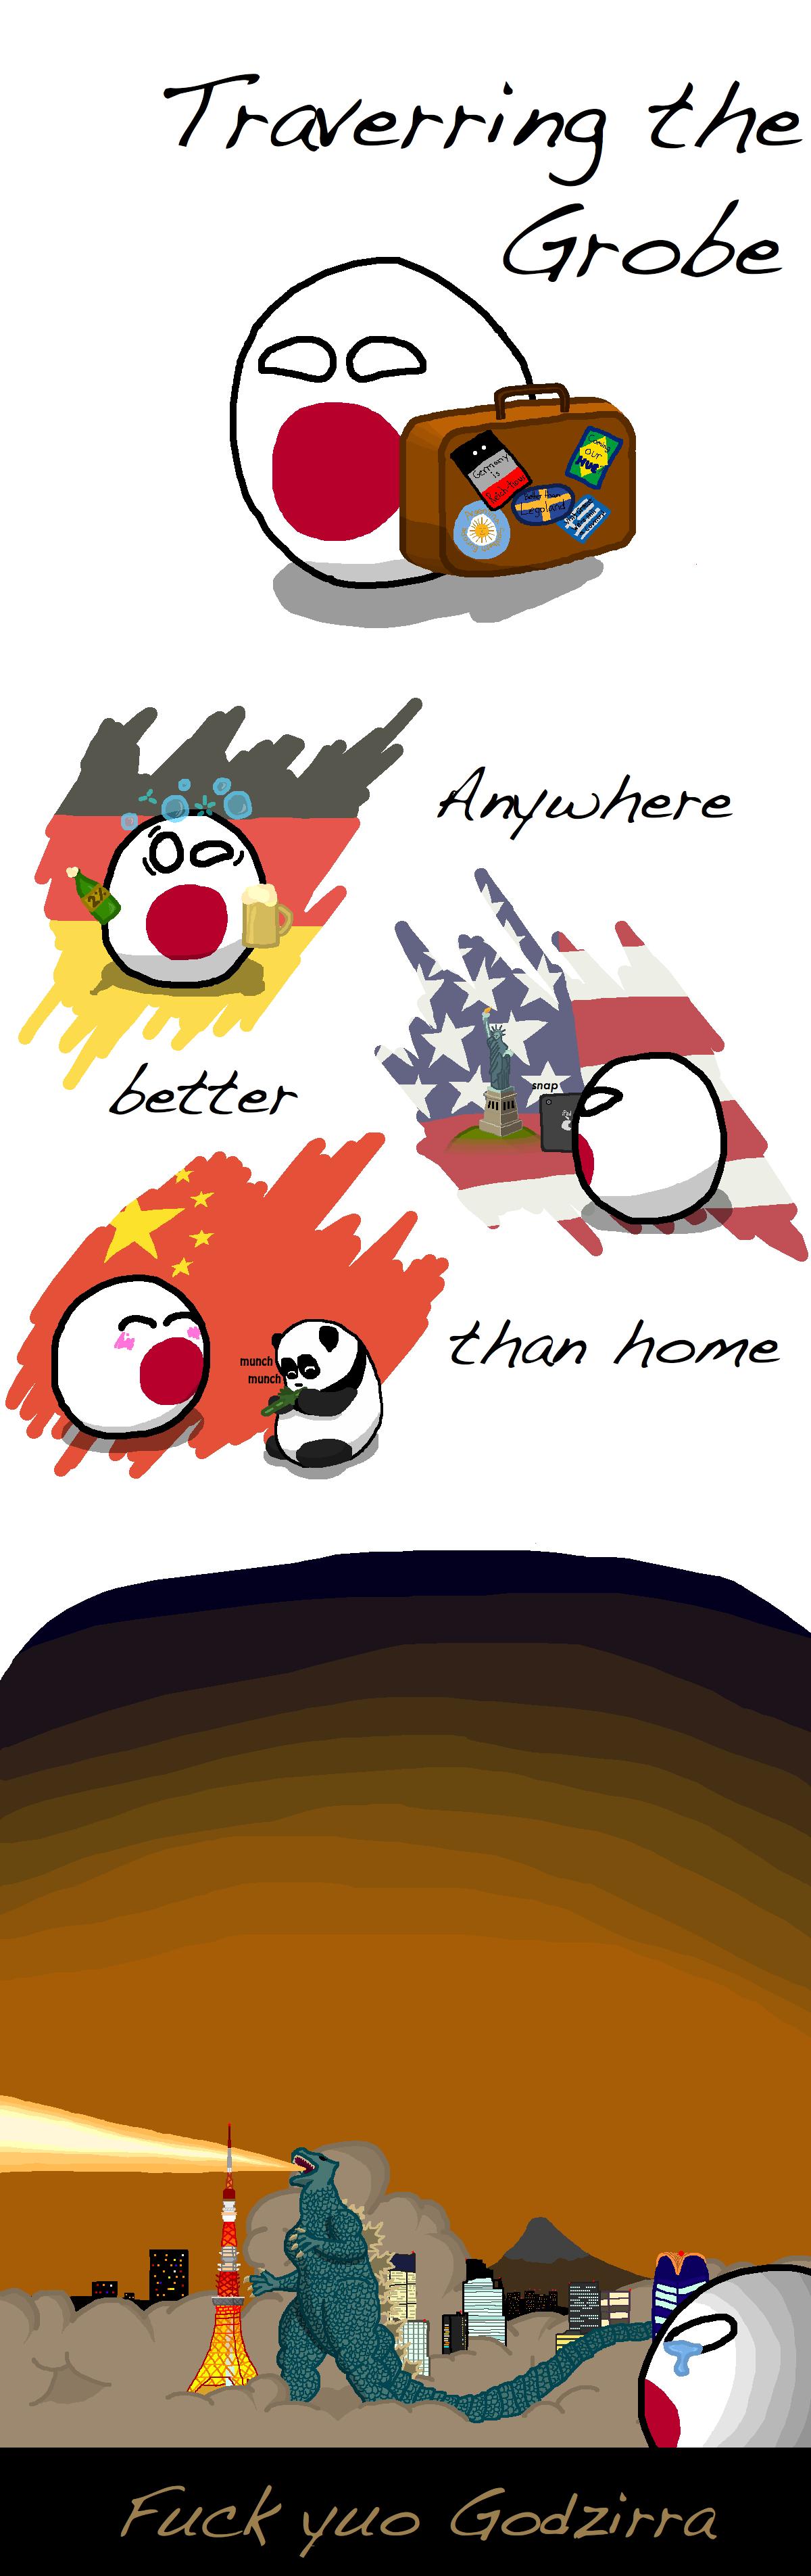 country-balls-wandering-soul-a-haiku